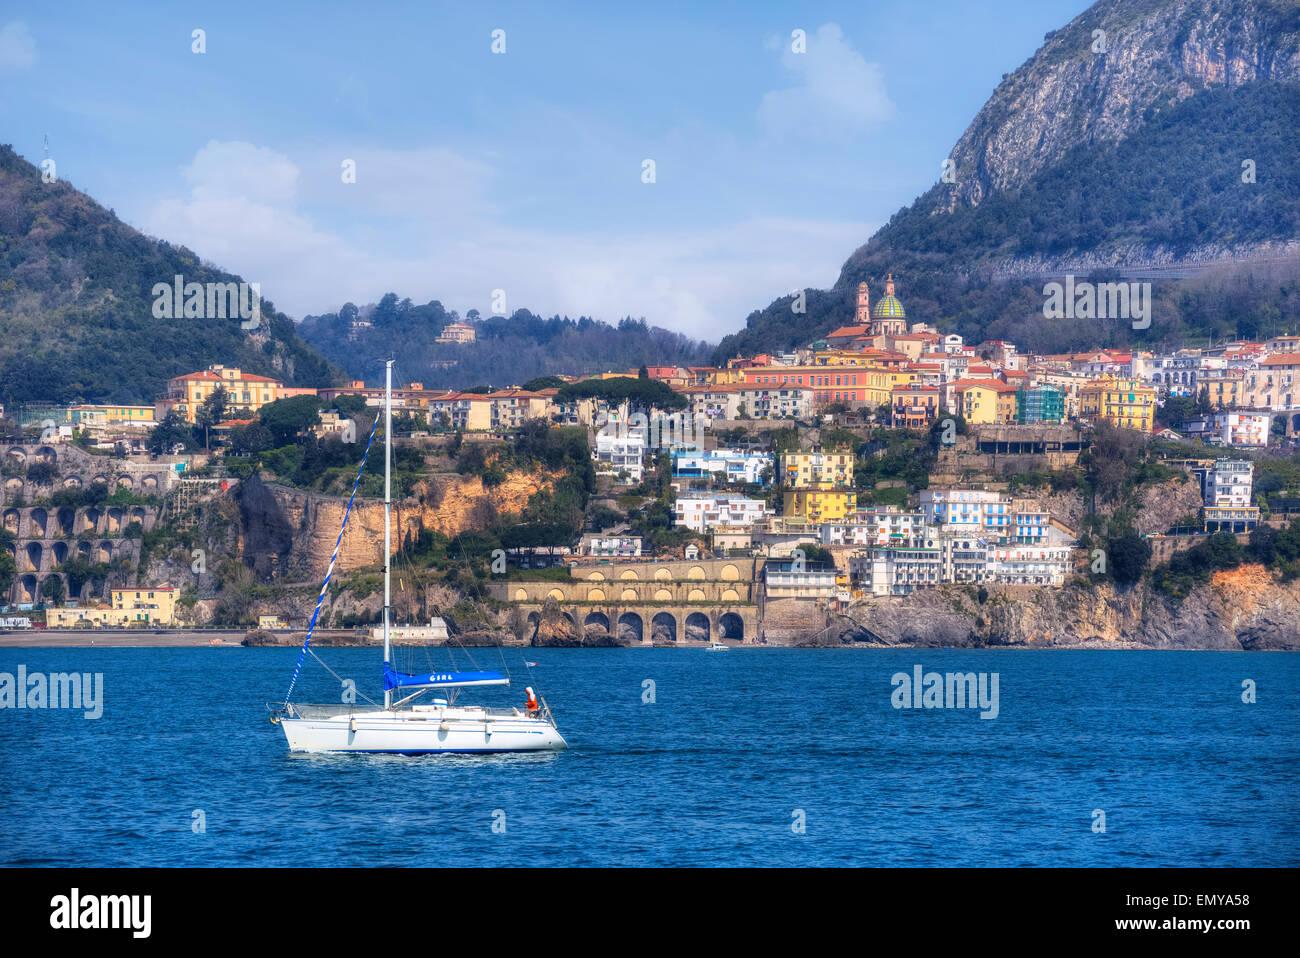 Vietri Sul Mare, Amalfi Coast, Campania, Italy Stock Photo